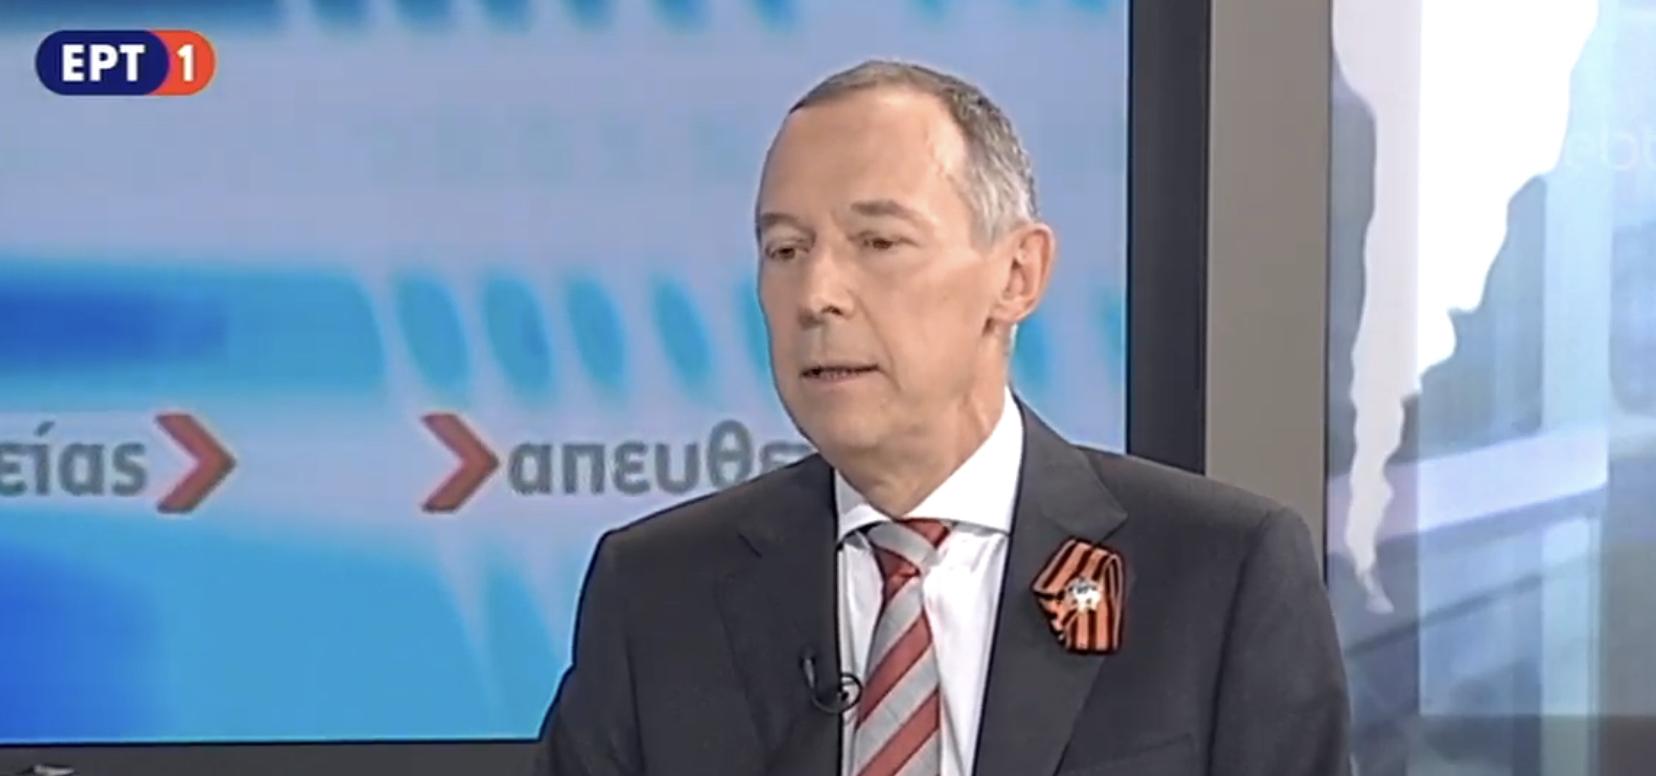 Maslov: «Επιθυμούμε την διμερή ανάπτυξη των σχέσεων μας με τις Βαλκανικές χώρες»